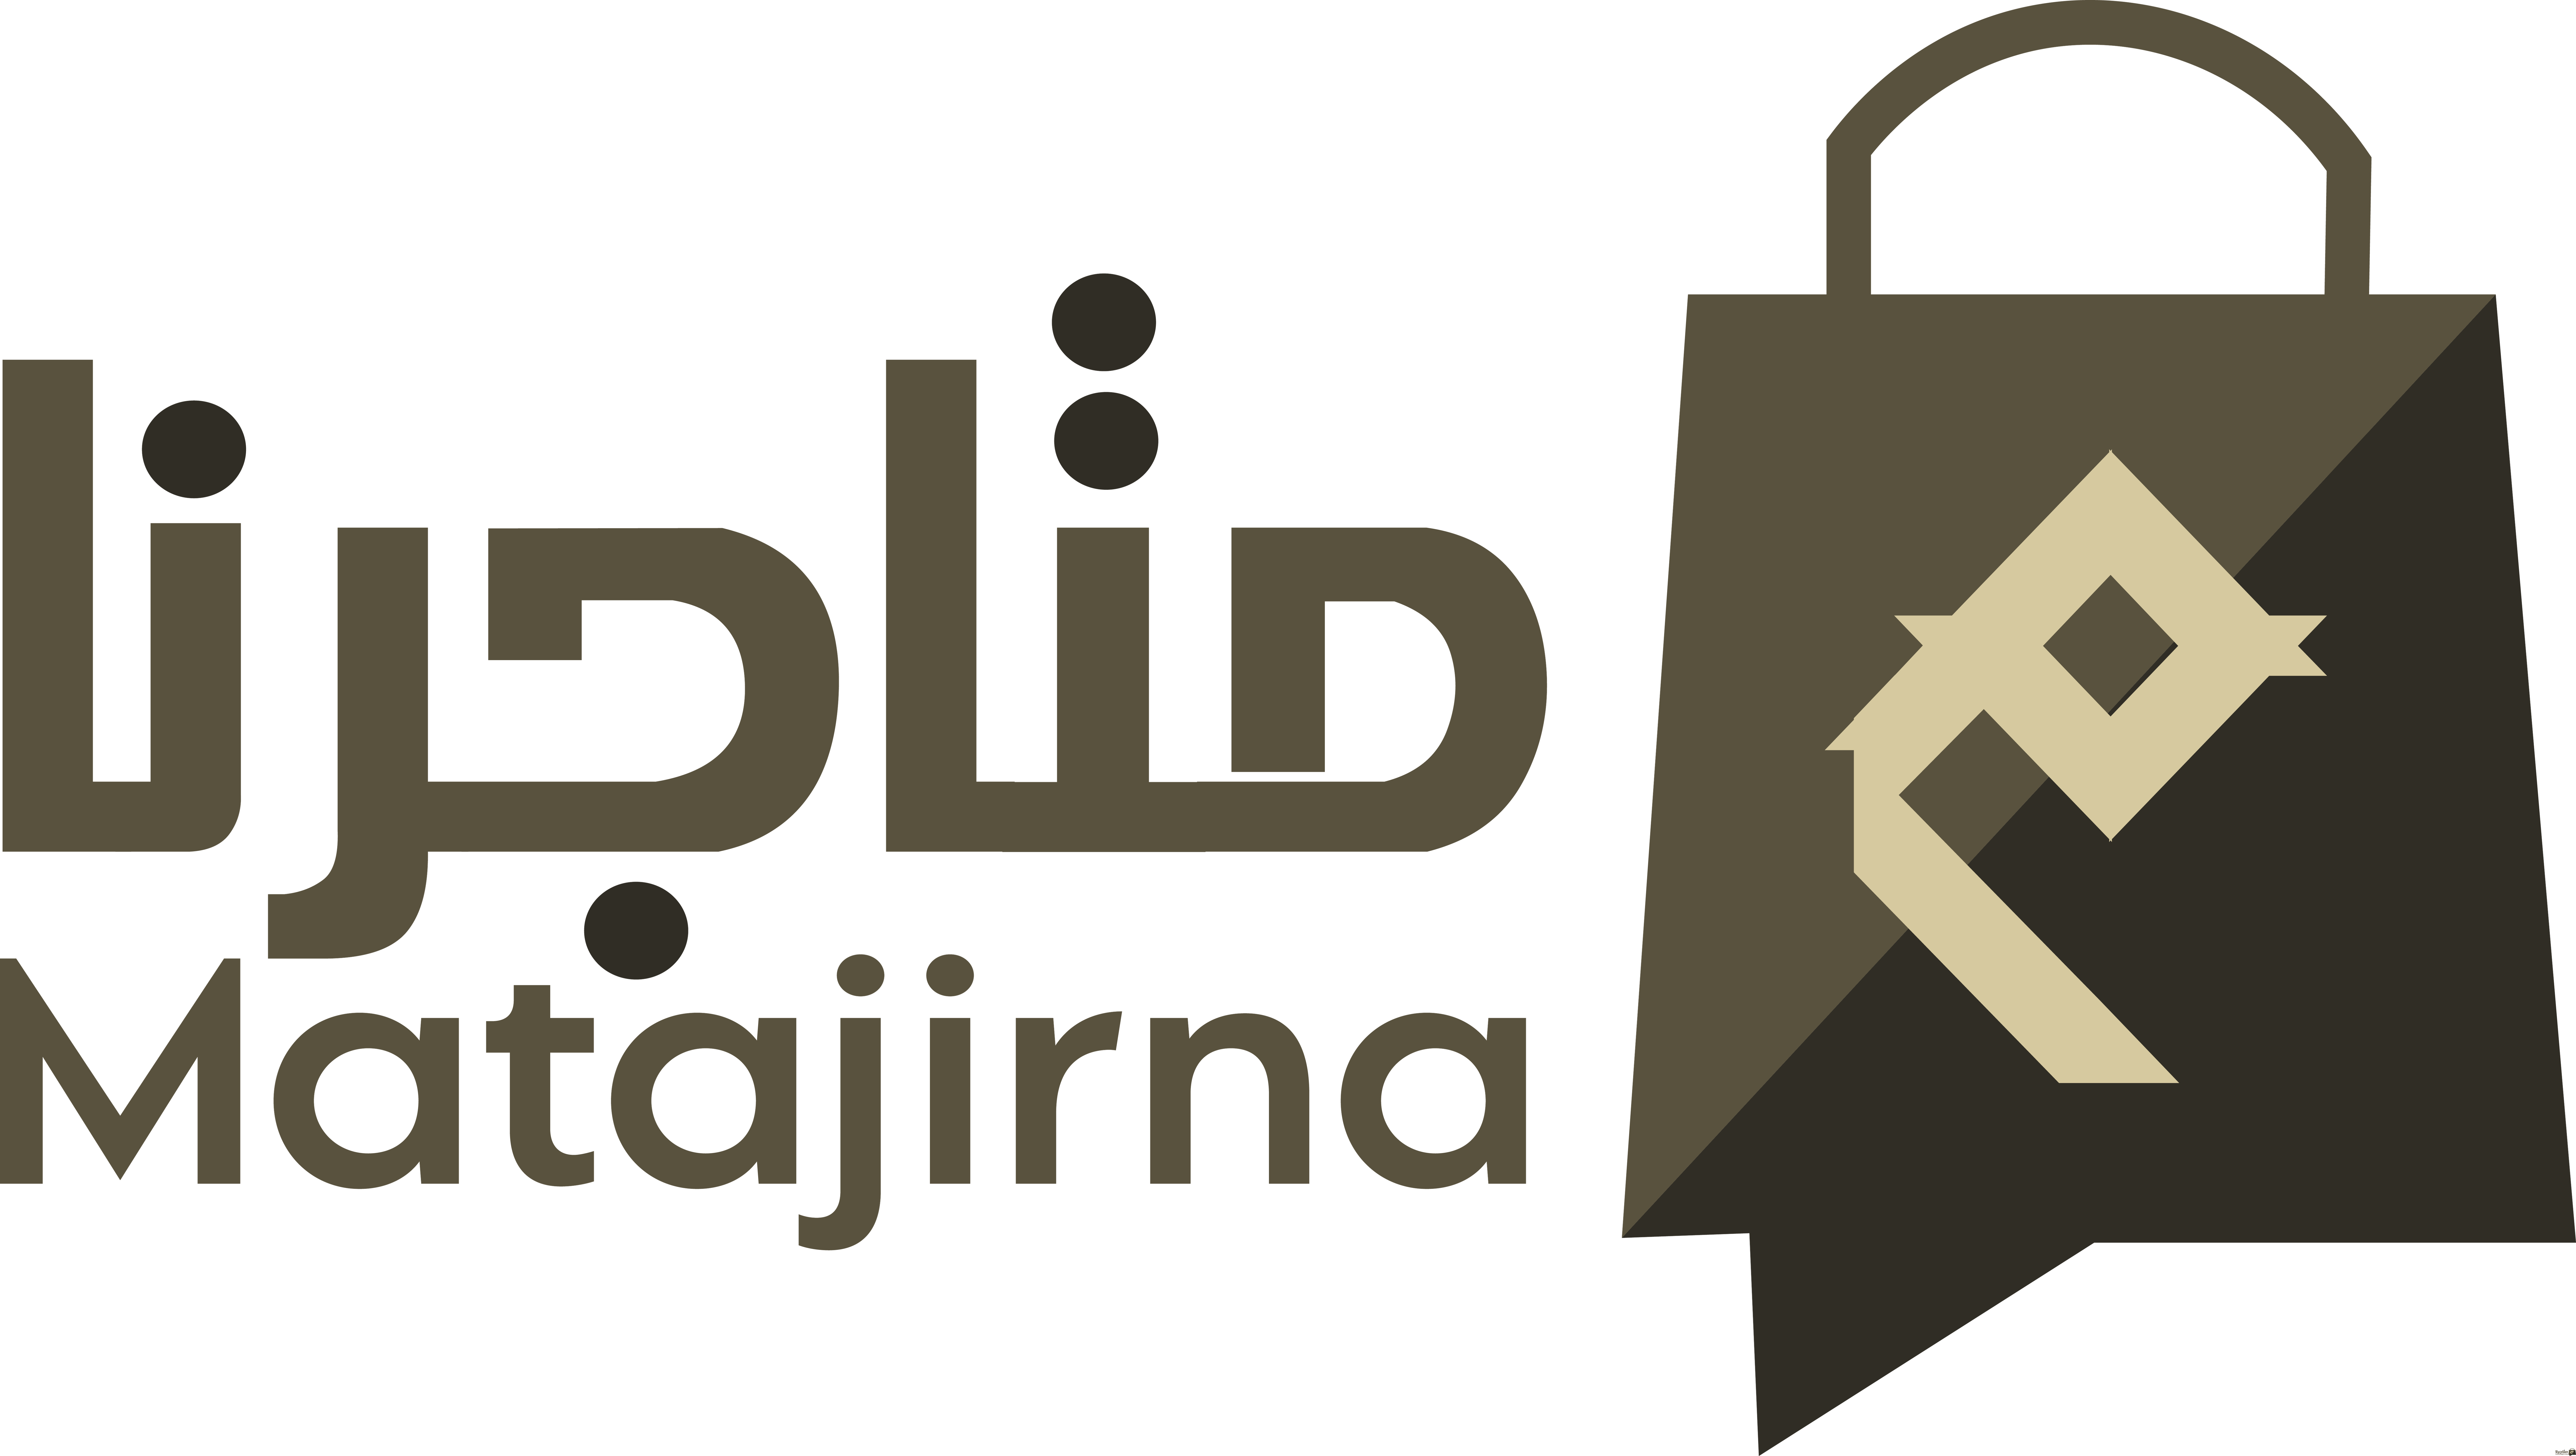 متاجرنا - Matajirna